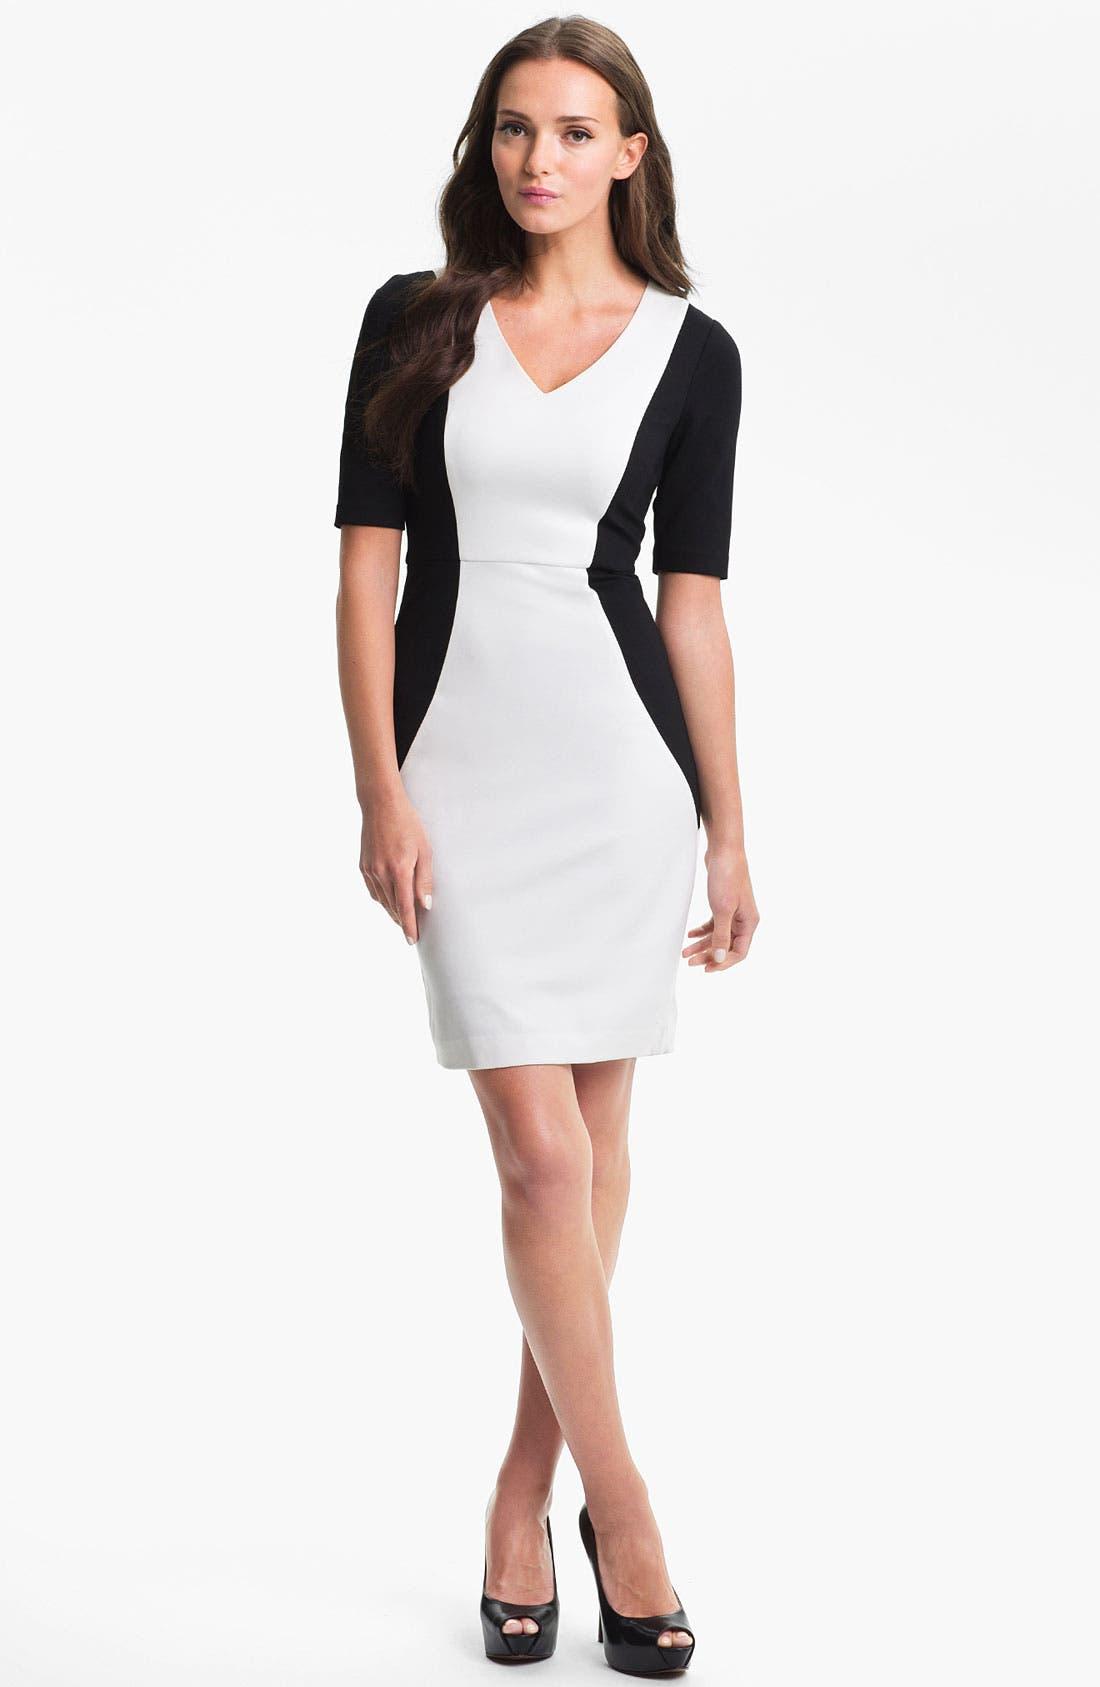 Main Image - Trina Turk 'Vamp' Stretch Knit Sheath Dress